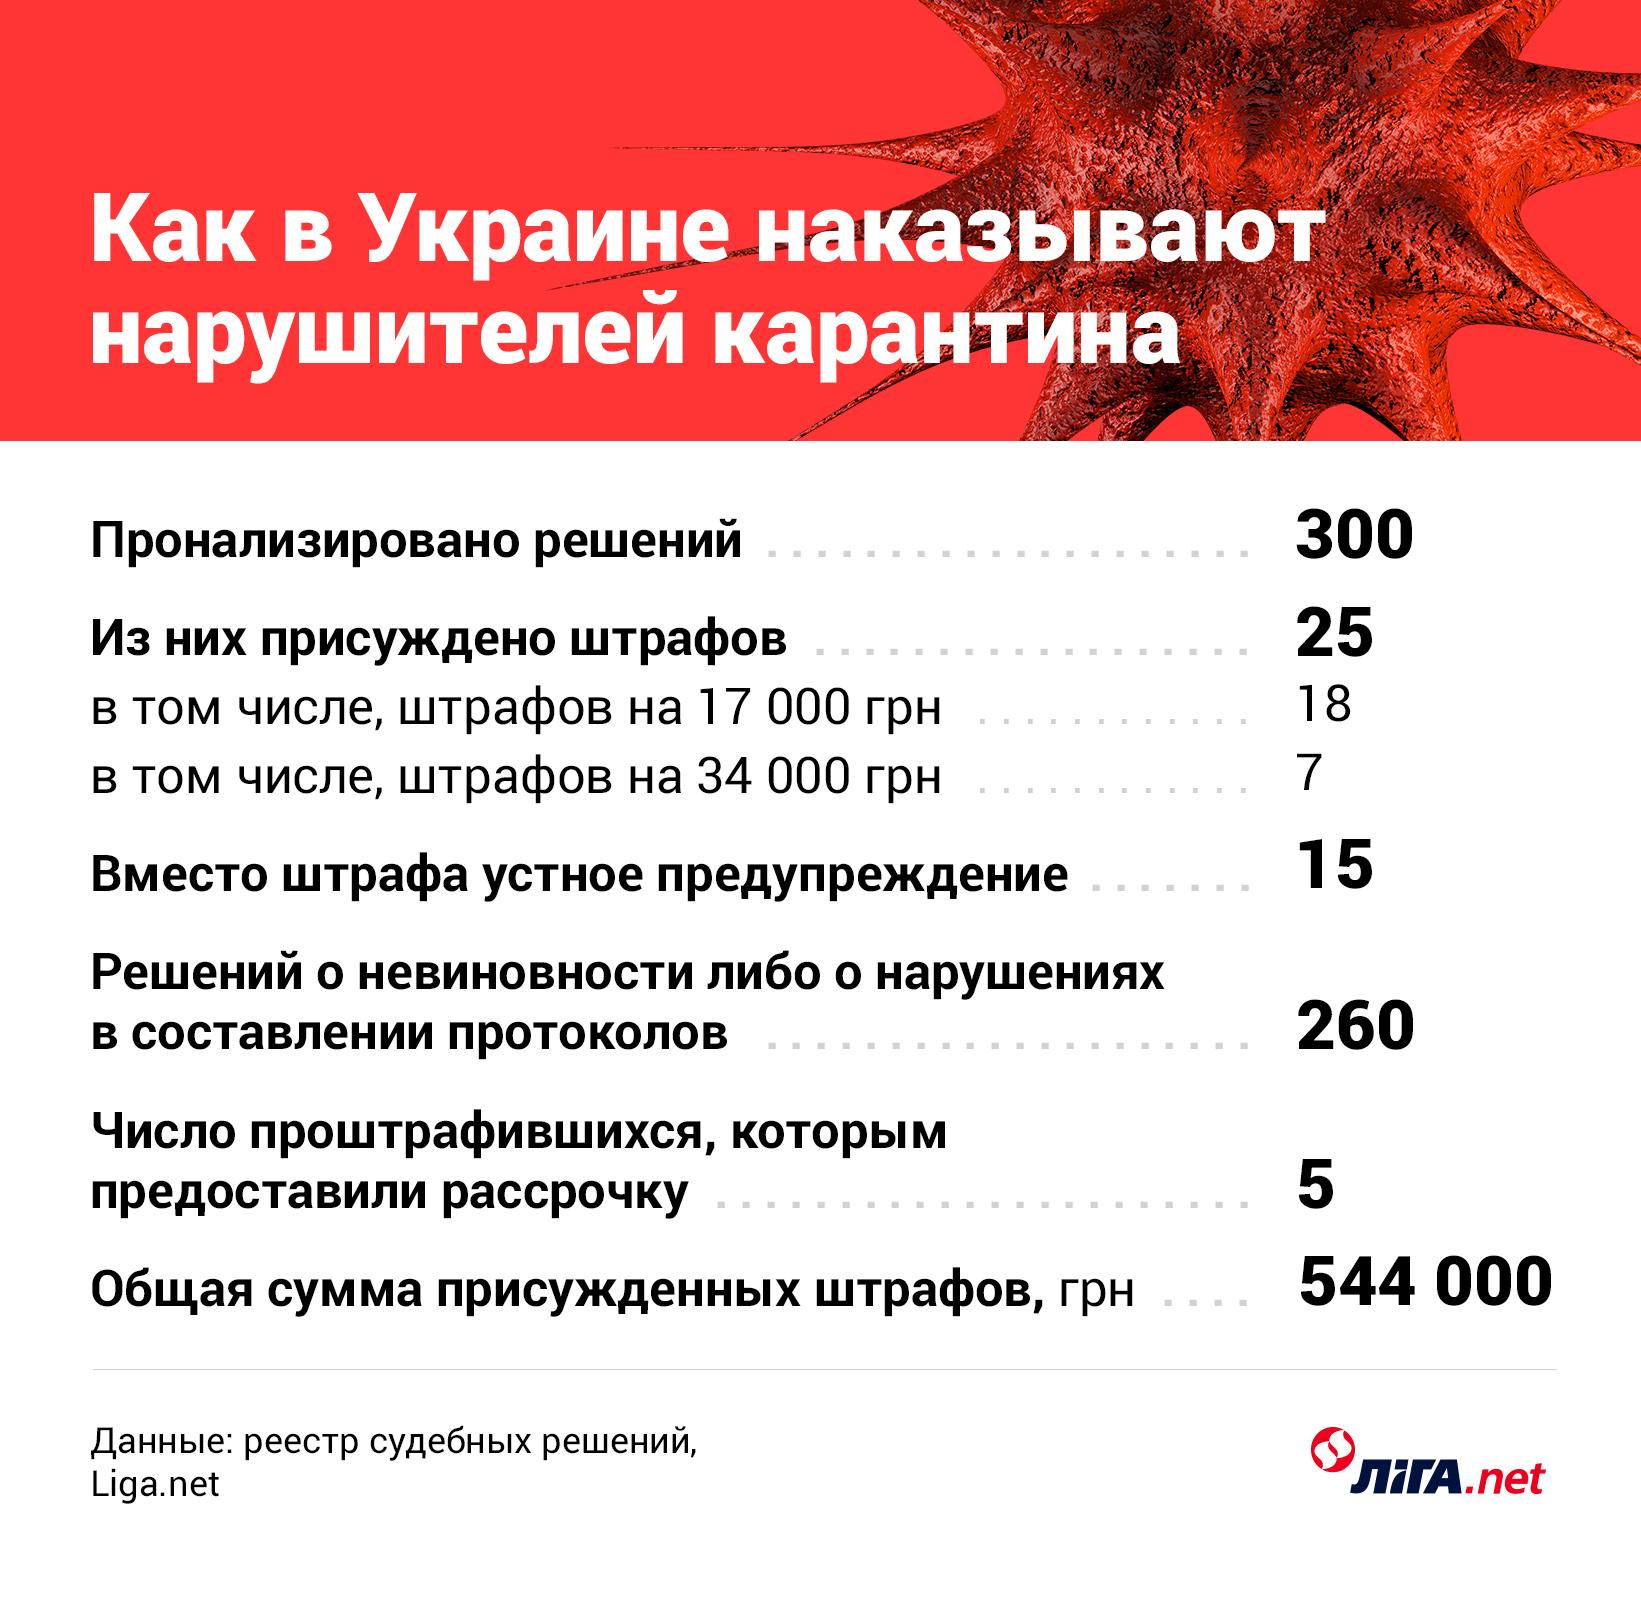 Продавали семечки, торговали утятами: 25 нарушителей карантина оштрафовали на 500 000 грн